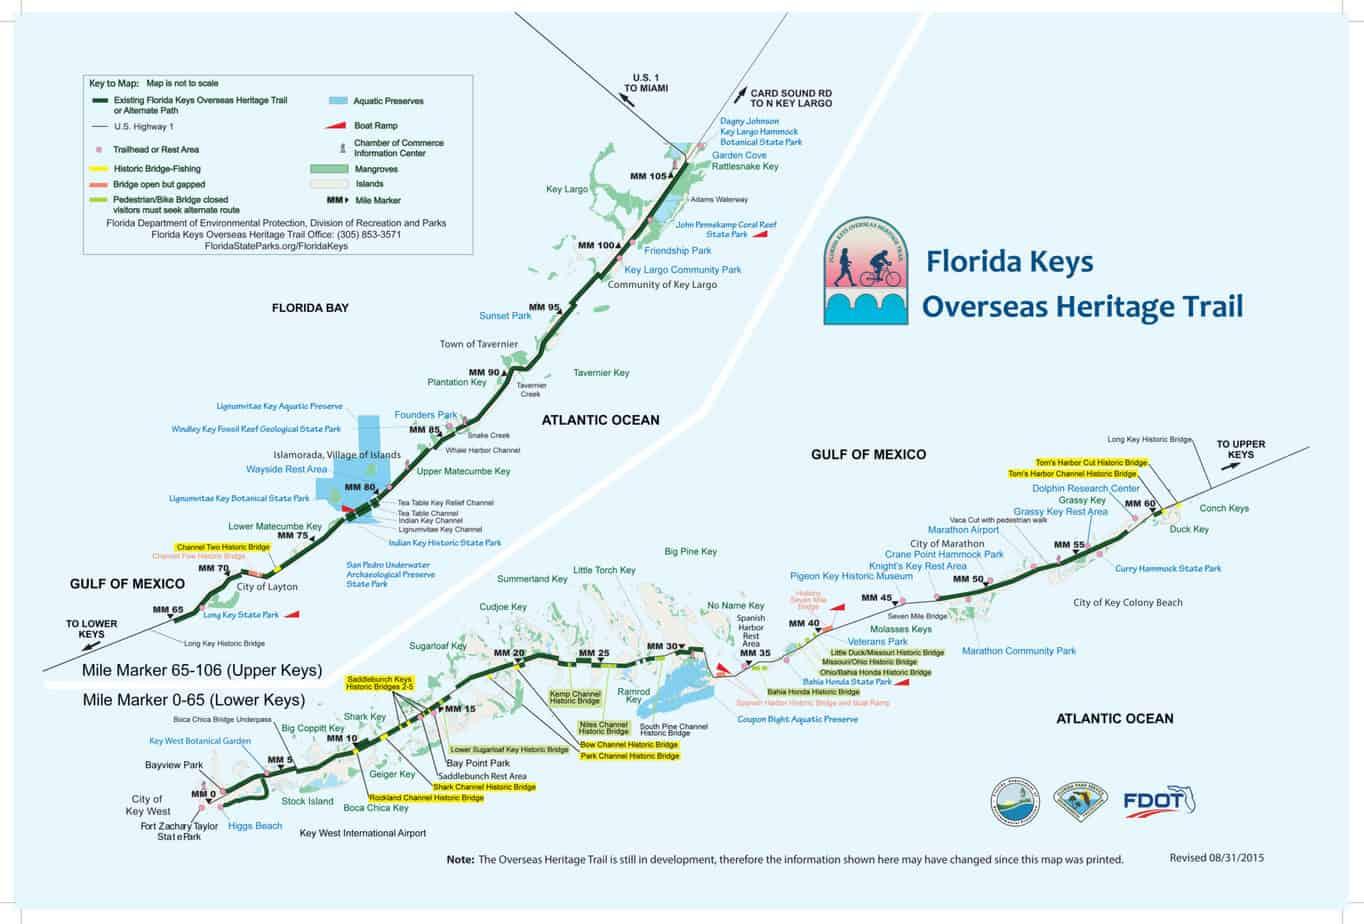 Biking The Florida Keys Overseas Heritage Trail Florida Rambler - Florida keys map pdf